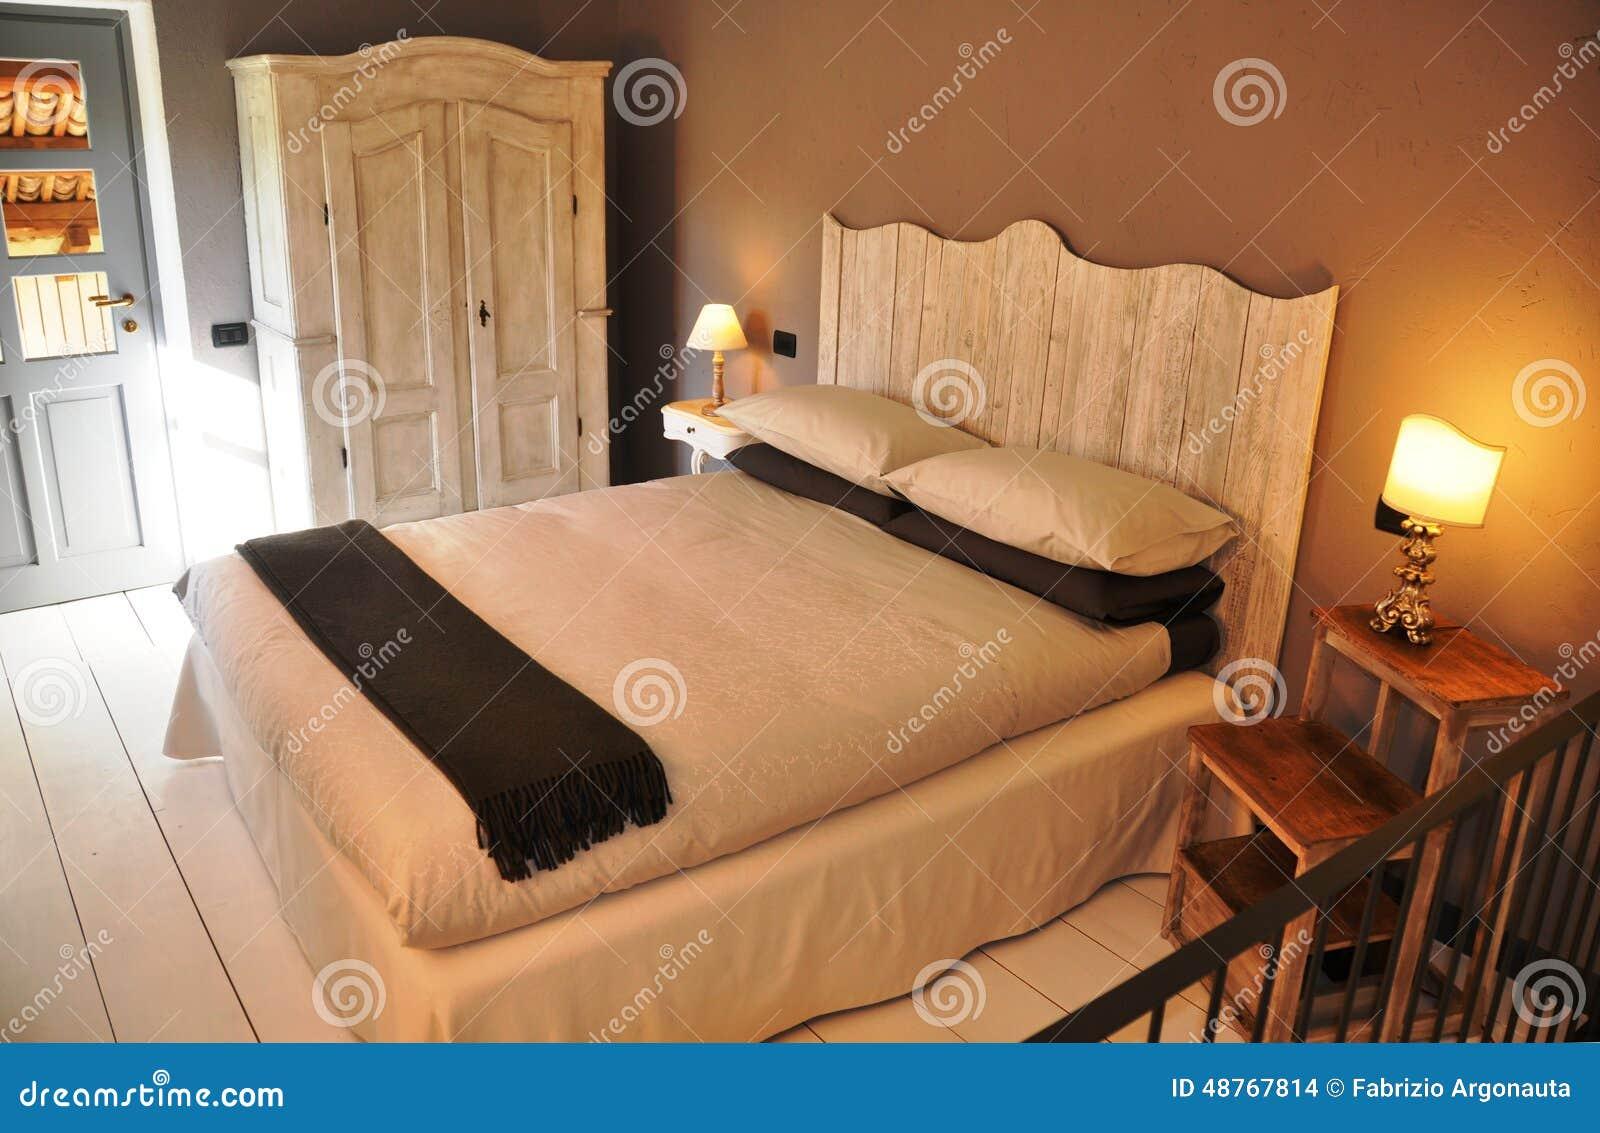 Cozy Italian Country Style Bedroom Stock Photo - Image ...